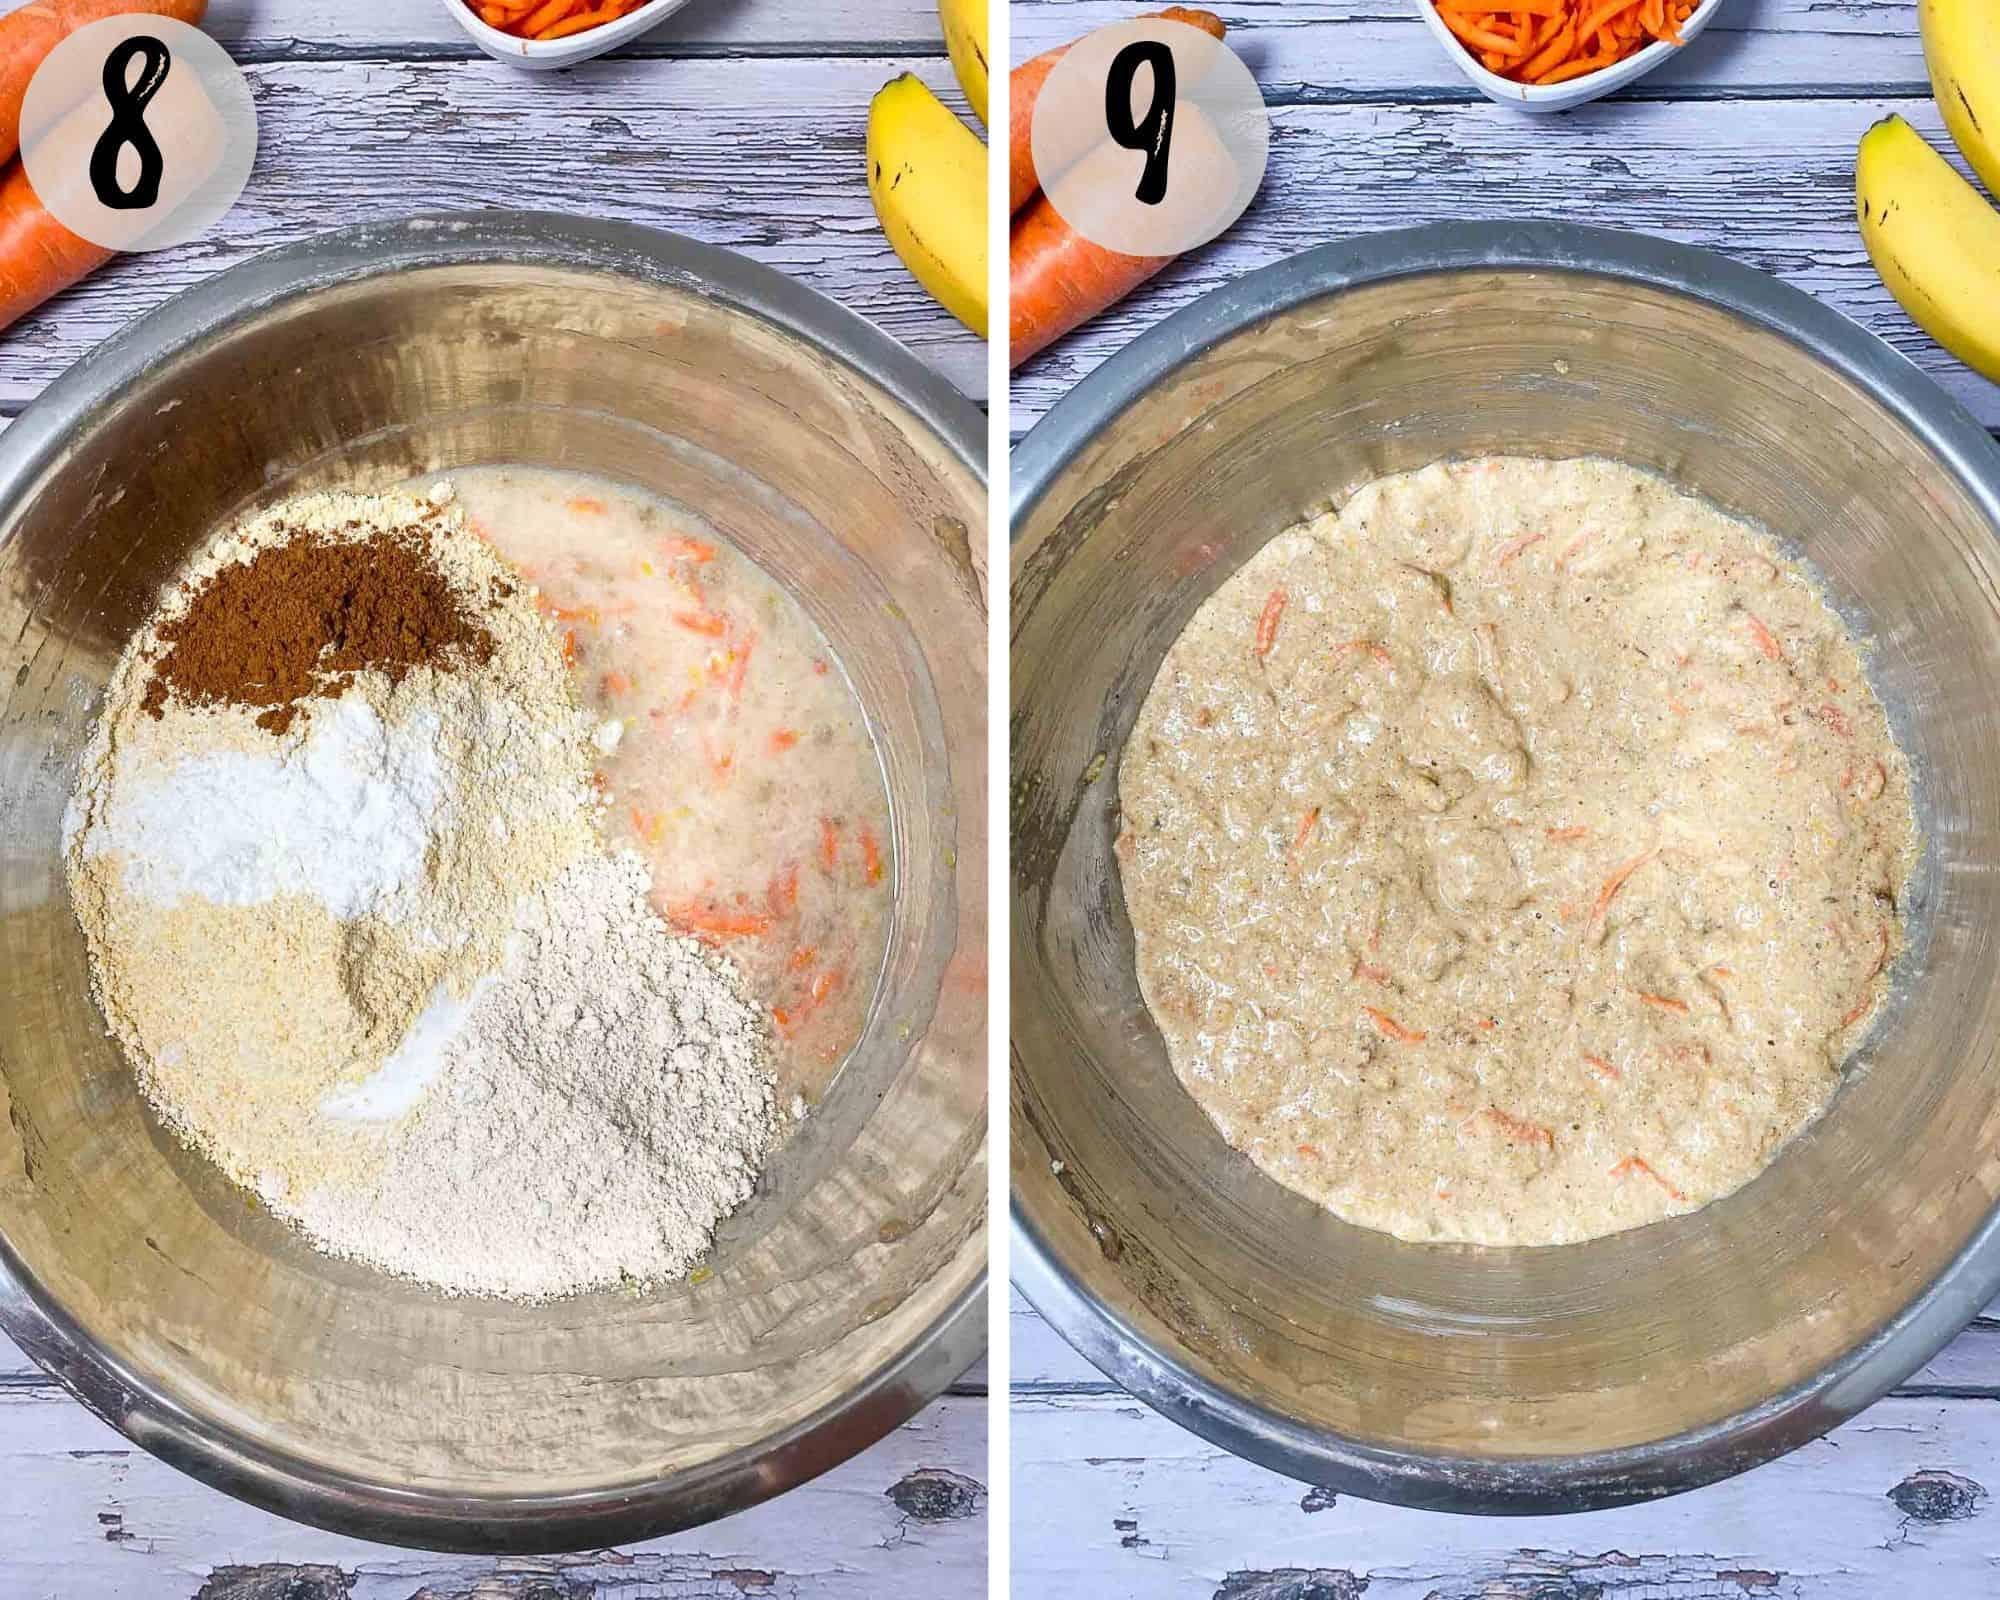 banana carrot muffin batter in large mixing bowl